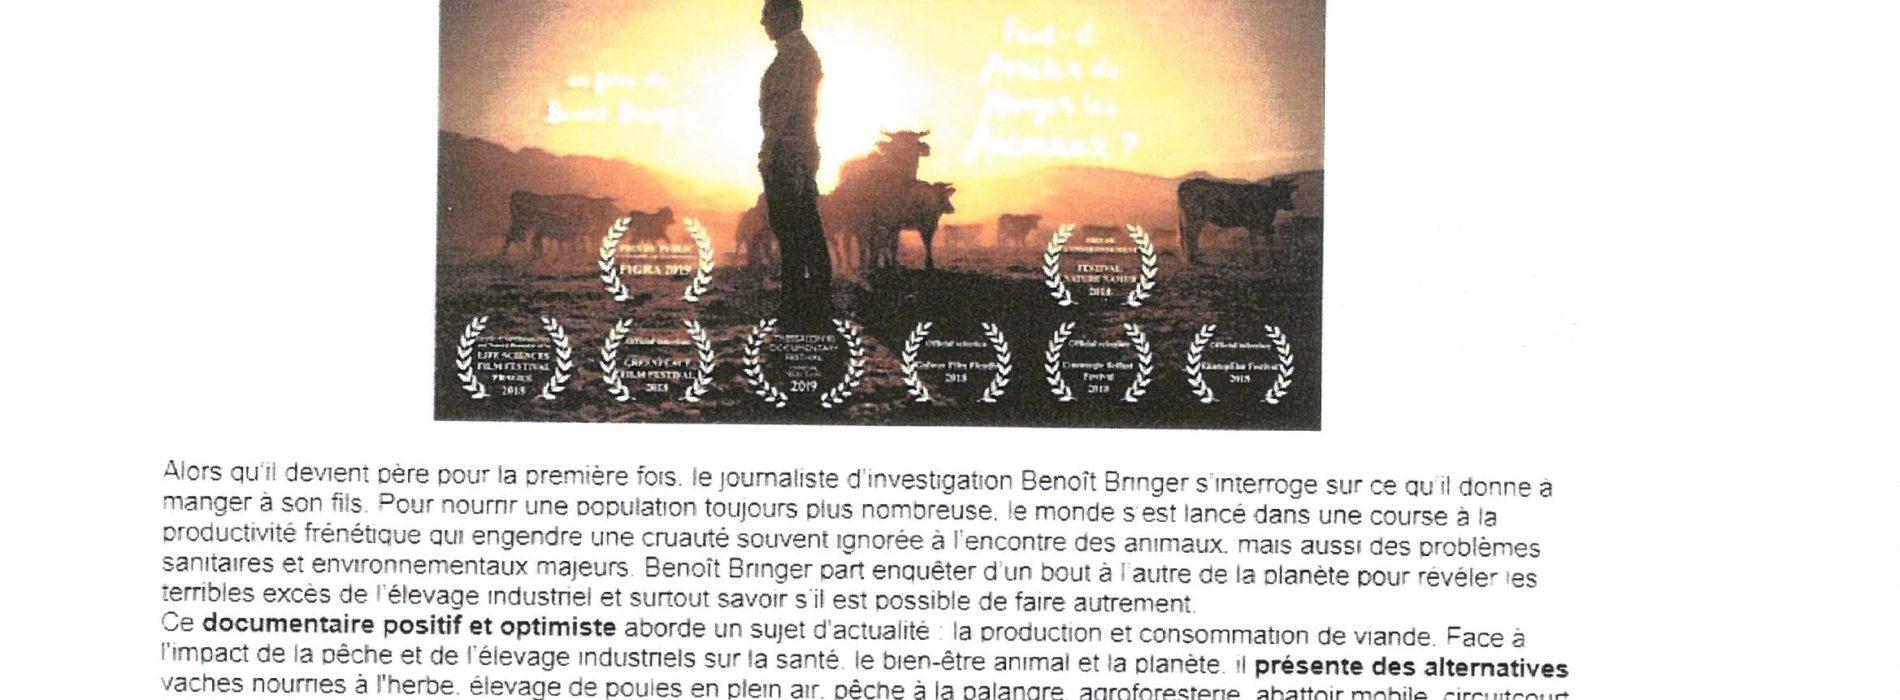 FILM FAUT IL ARRETER DE MANGER DES ANIMAUX JEUDI 7 NOVEMBRE 20H15 CENTRE SOCIO CULTUREL ECLAM